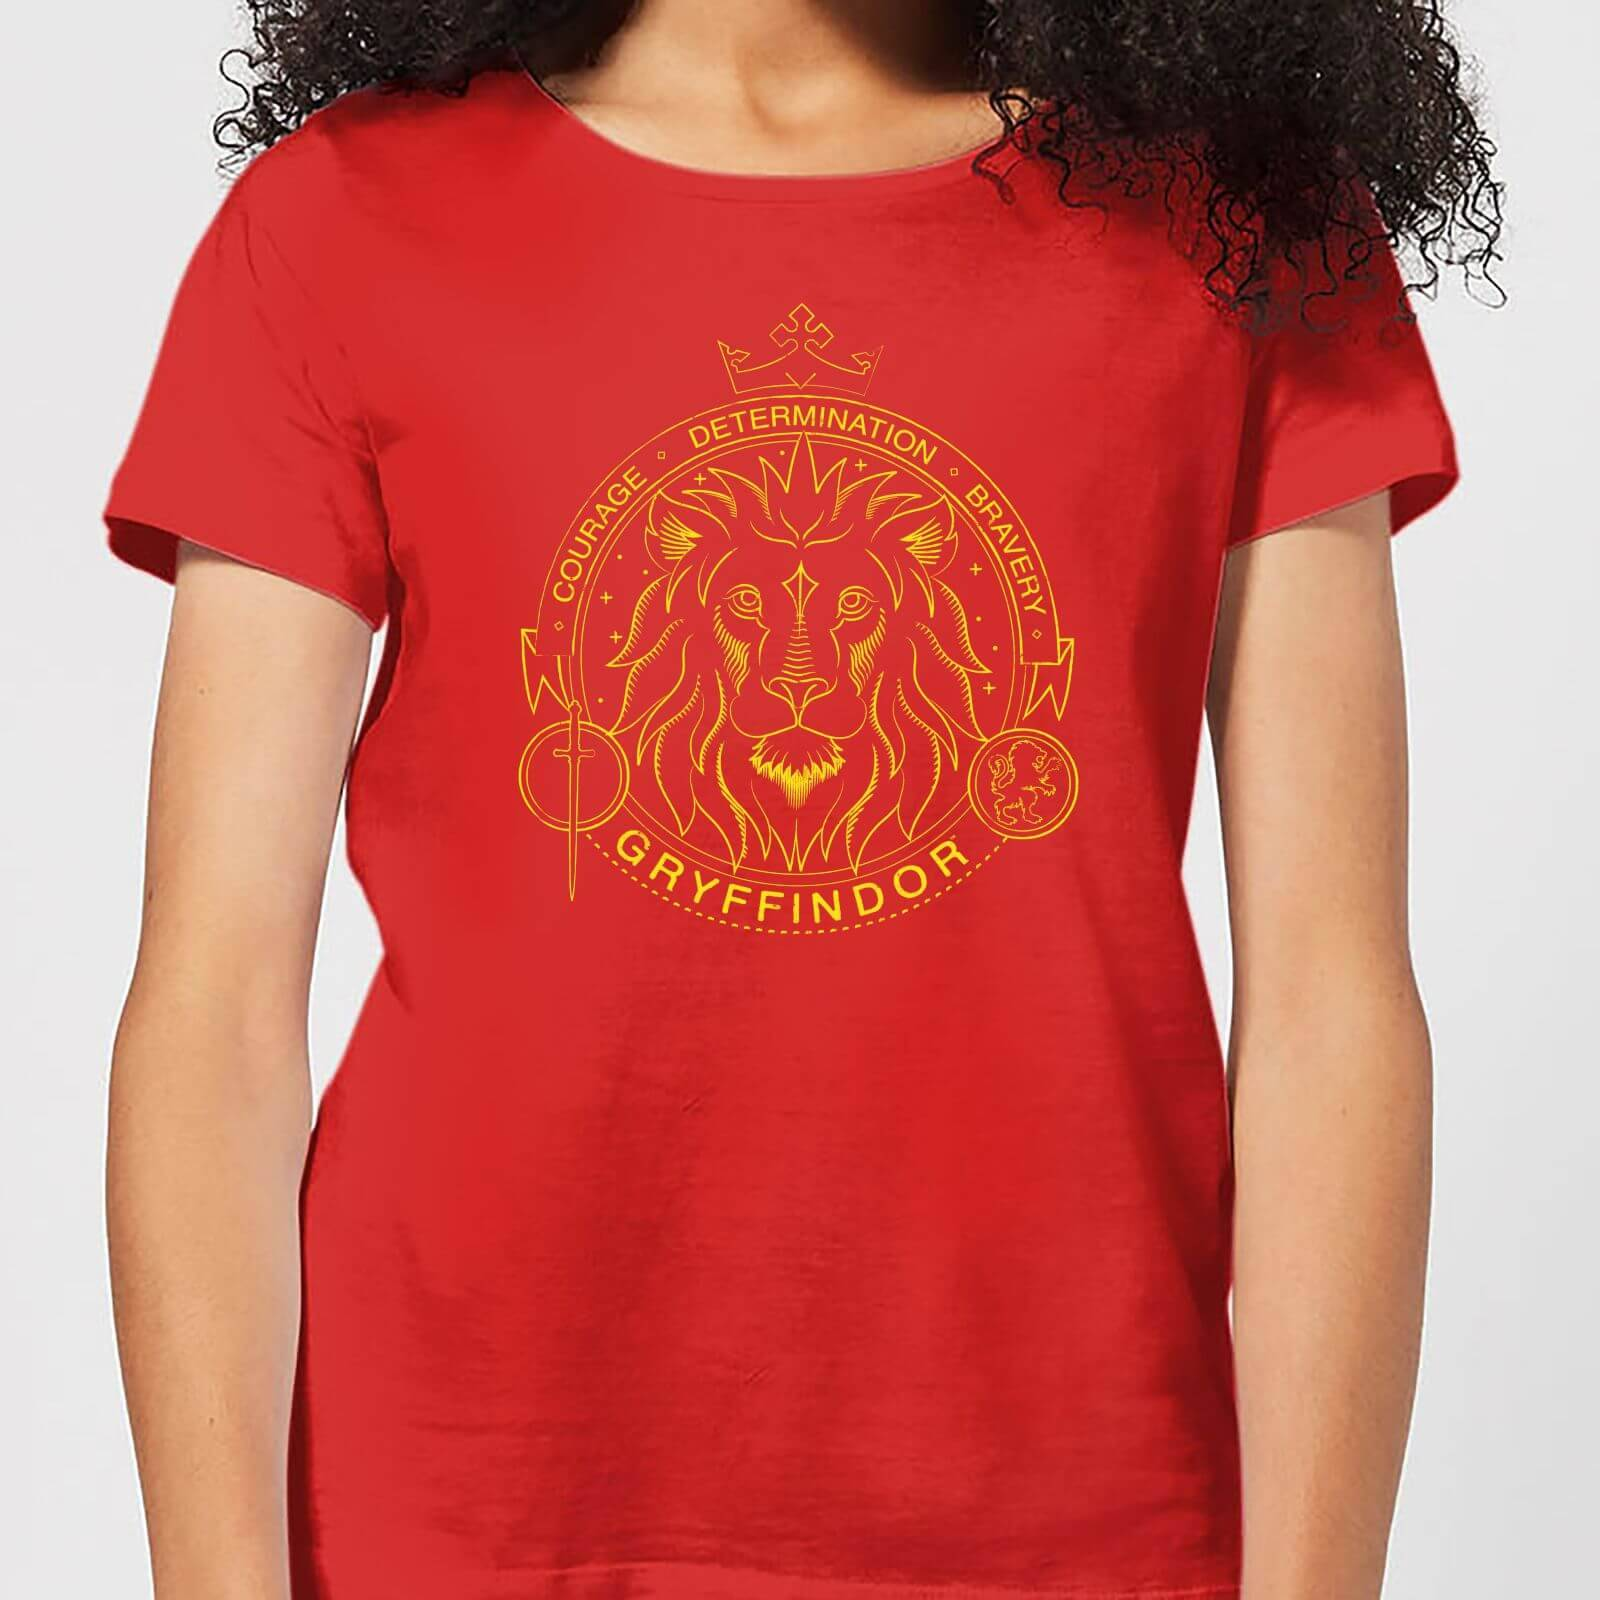 Harry Potter Gryffindor Lion Badge Women's T-Shirt - Red - S - Rouge